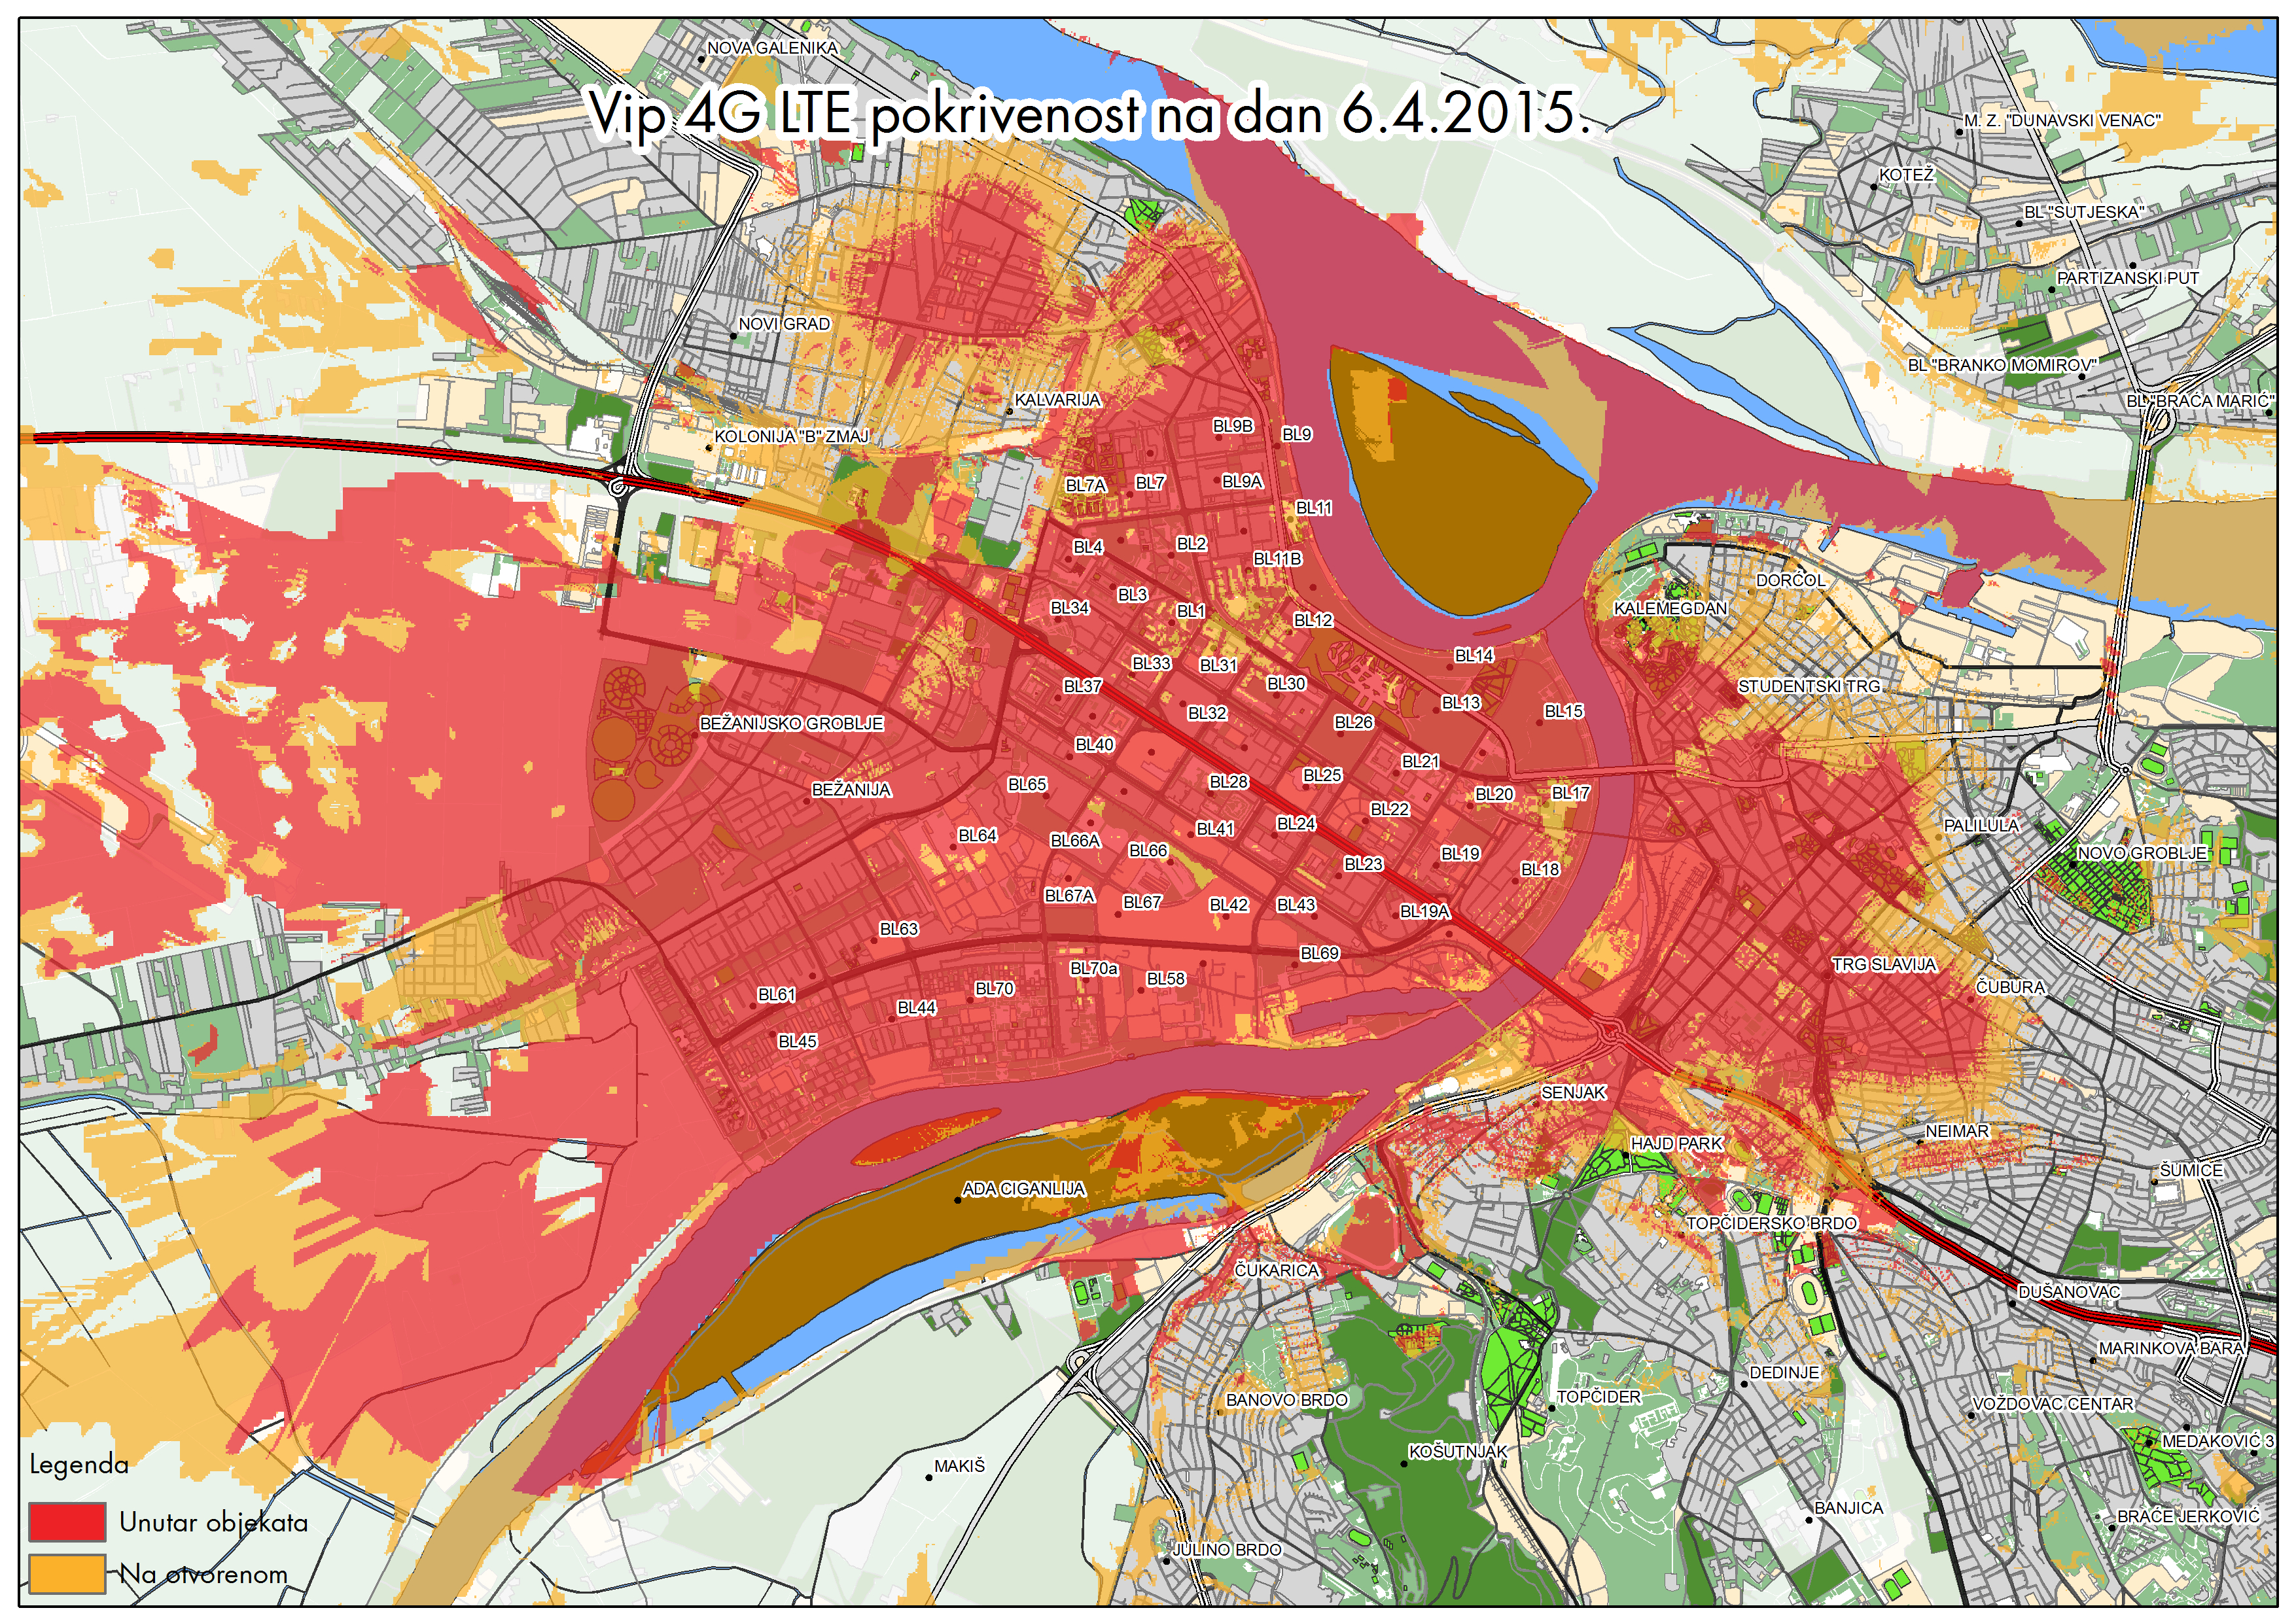 vip mapa pokrivenosti Vip Mobile LTE (4G) realan test   Zverko.rs vip mapa pokrivenosti